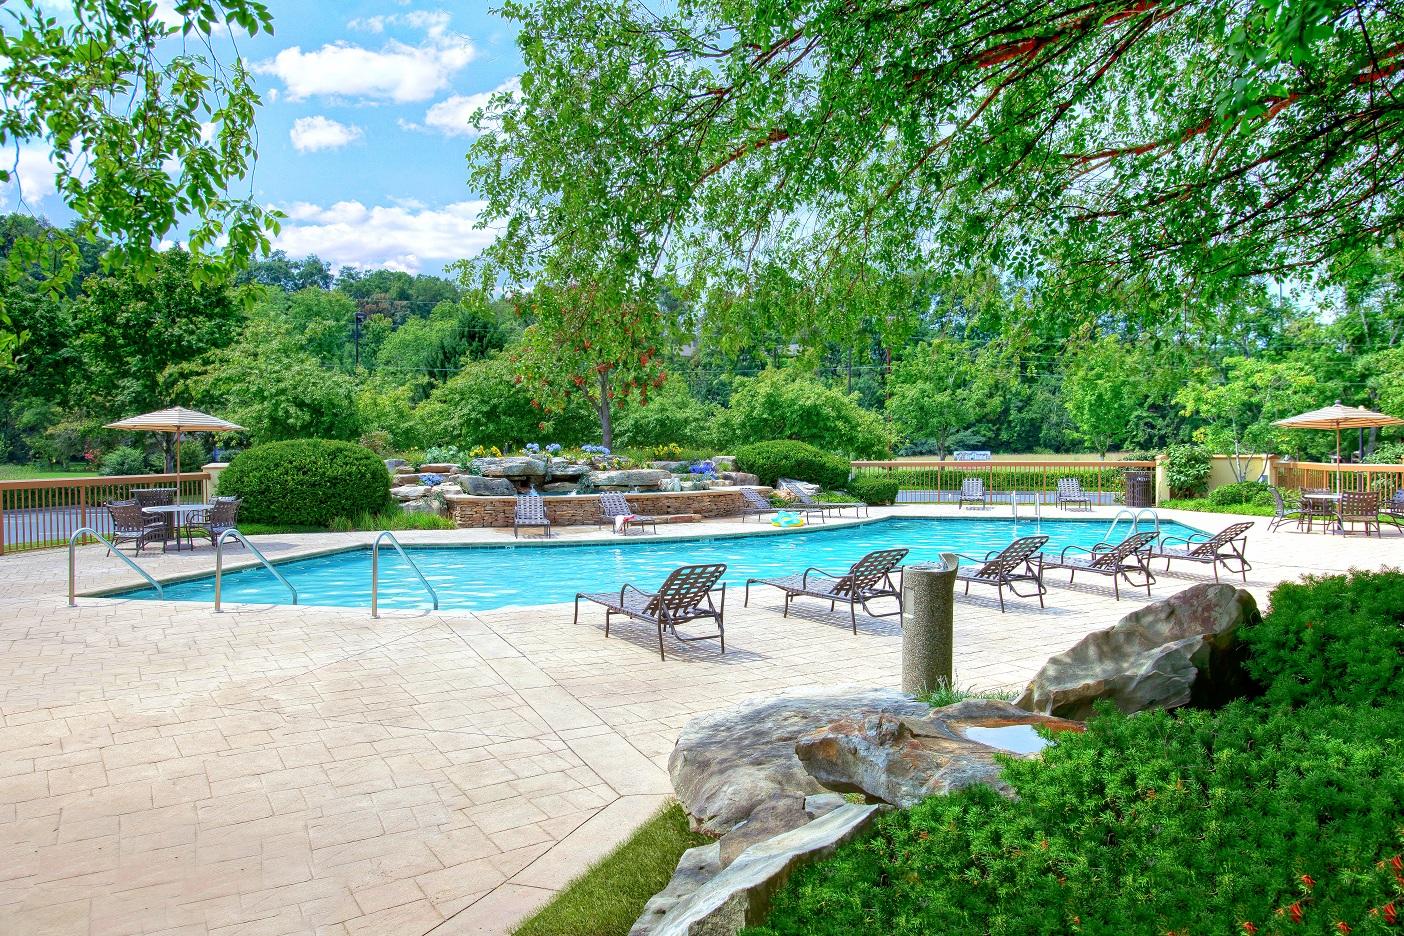 Shular Inn - Outdoor Pool - Wide Shot - Small.jpg